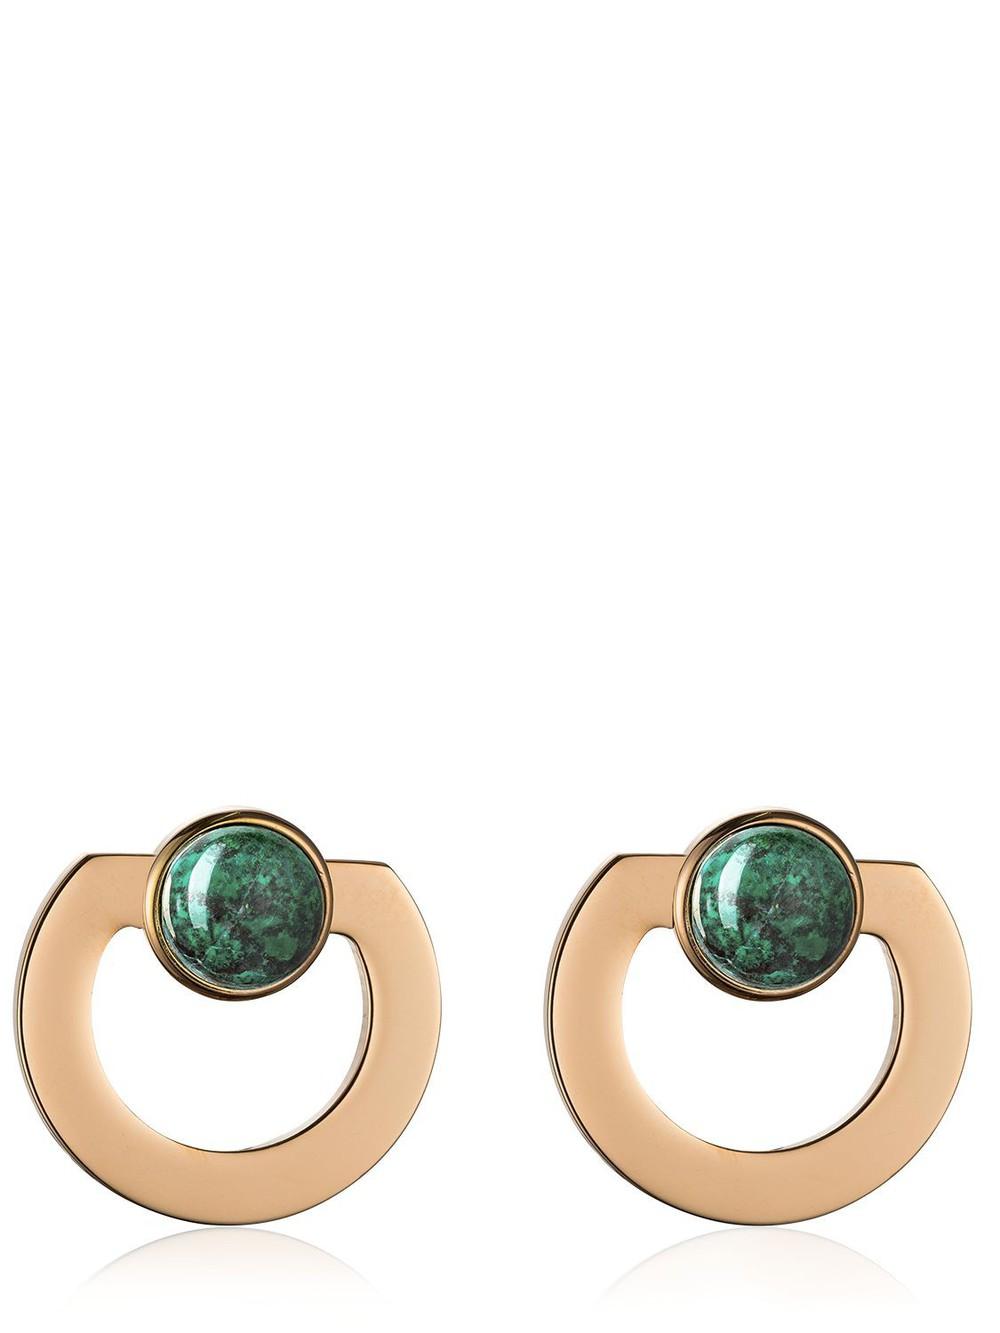 VITA FEDE Moneta Open Stone Earrings in gold / green / rose